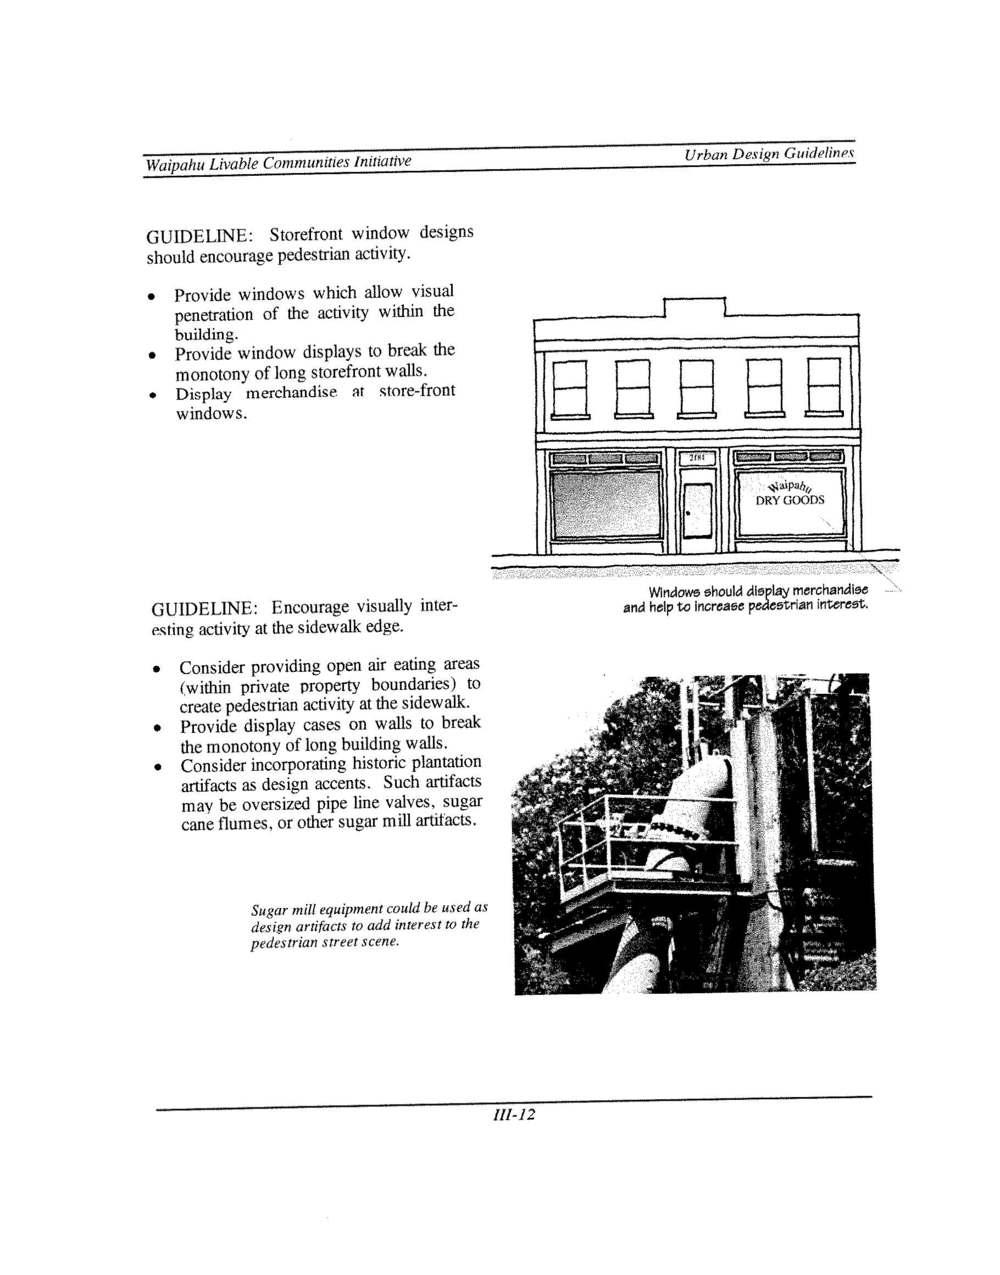 160531_WaipahuLivableCommunities(1998)_Page_102.jpg